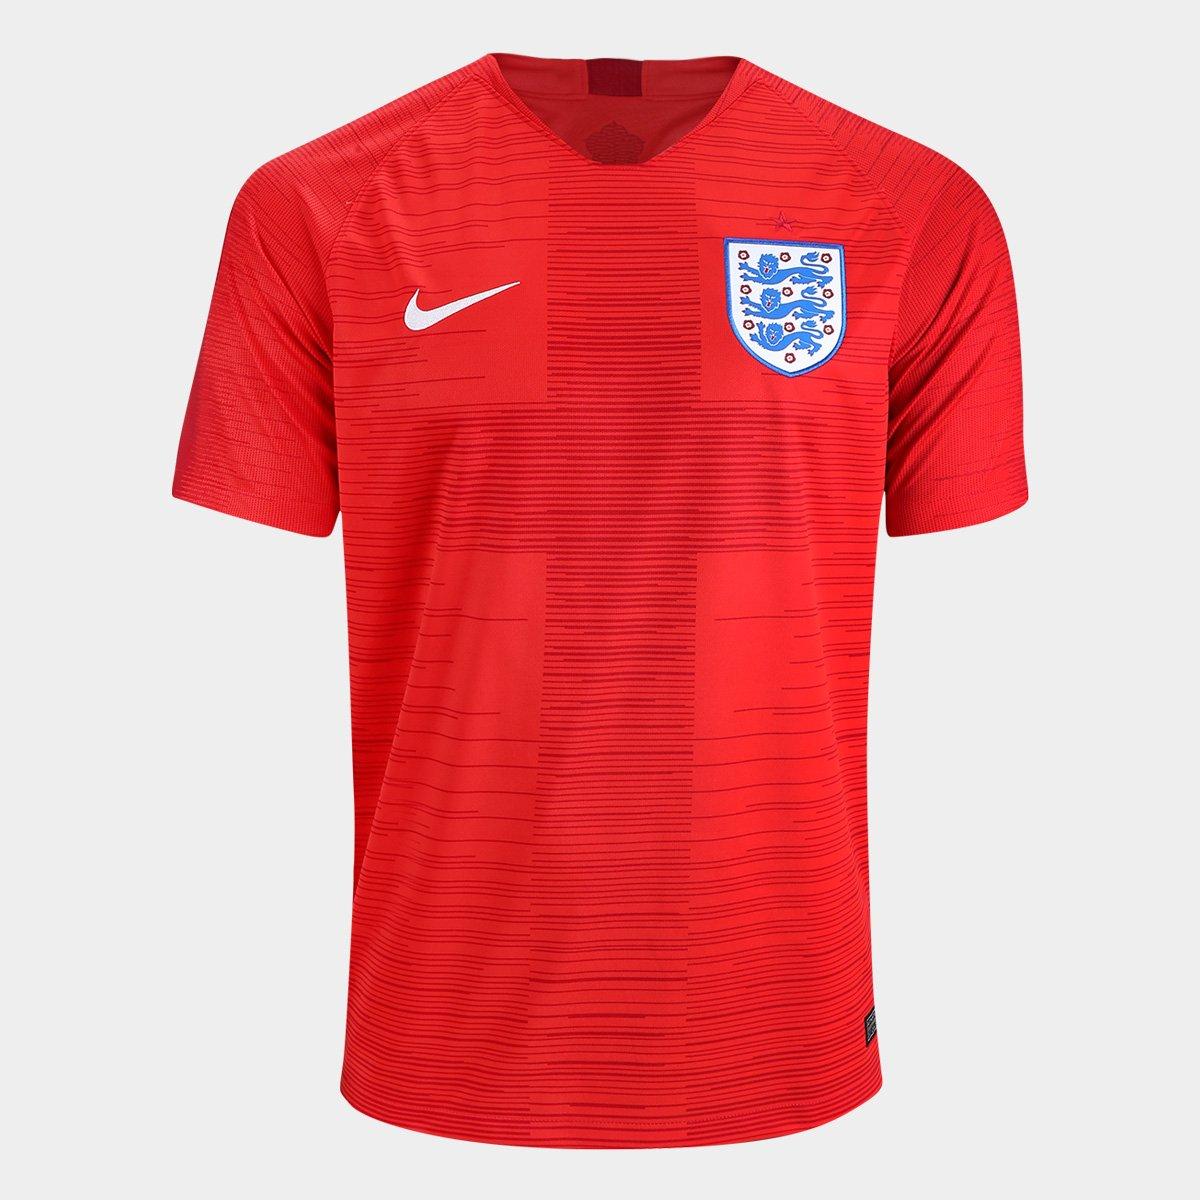 7c7db43706648 Camisa Seleção Inglaterra Away 2018 s n° Torcedor Nike Masculino - Compre  Agora